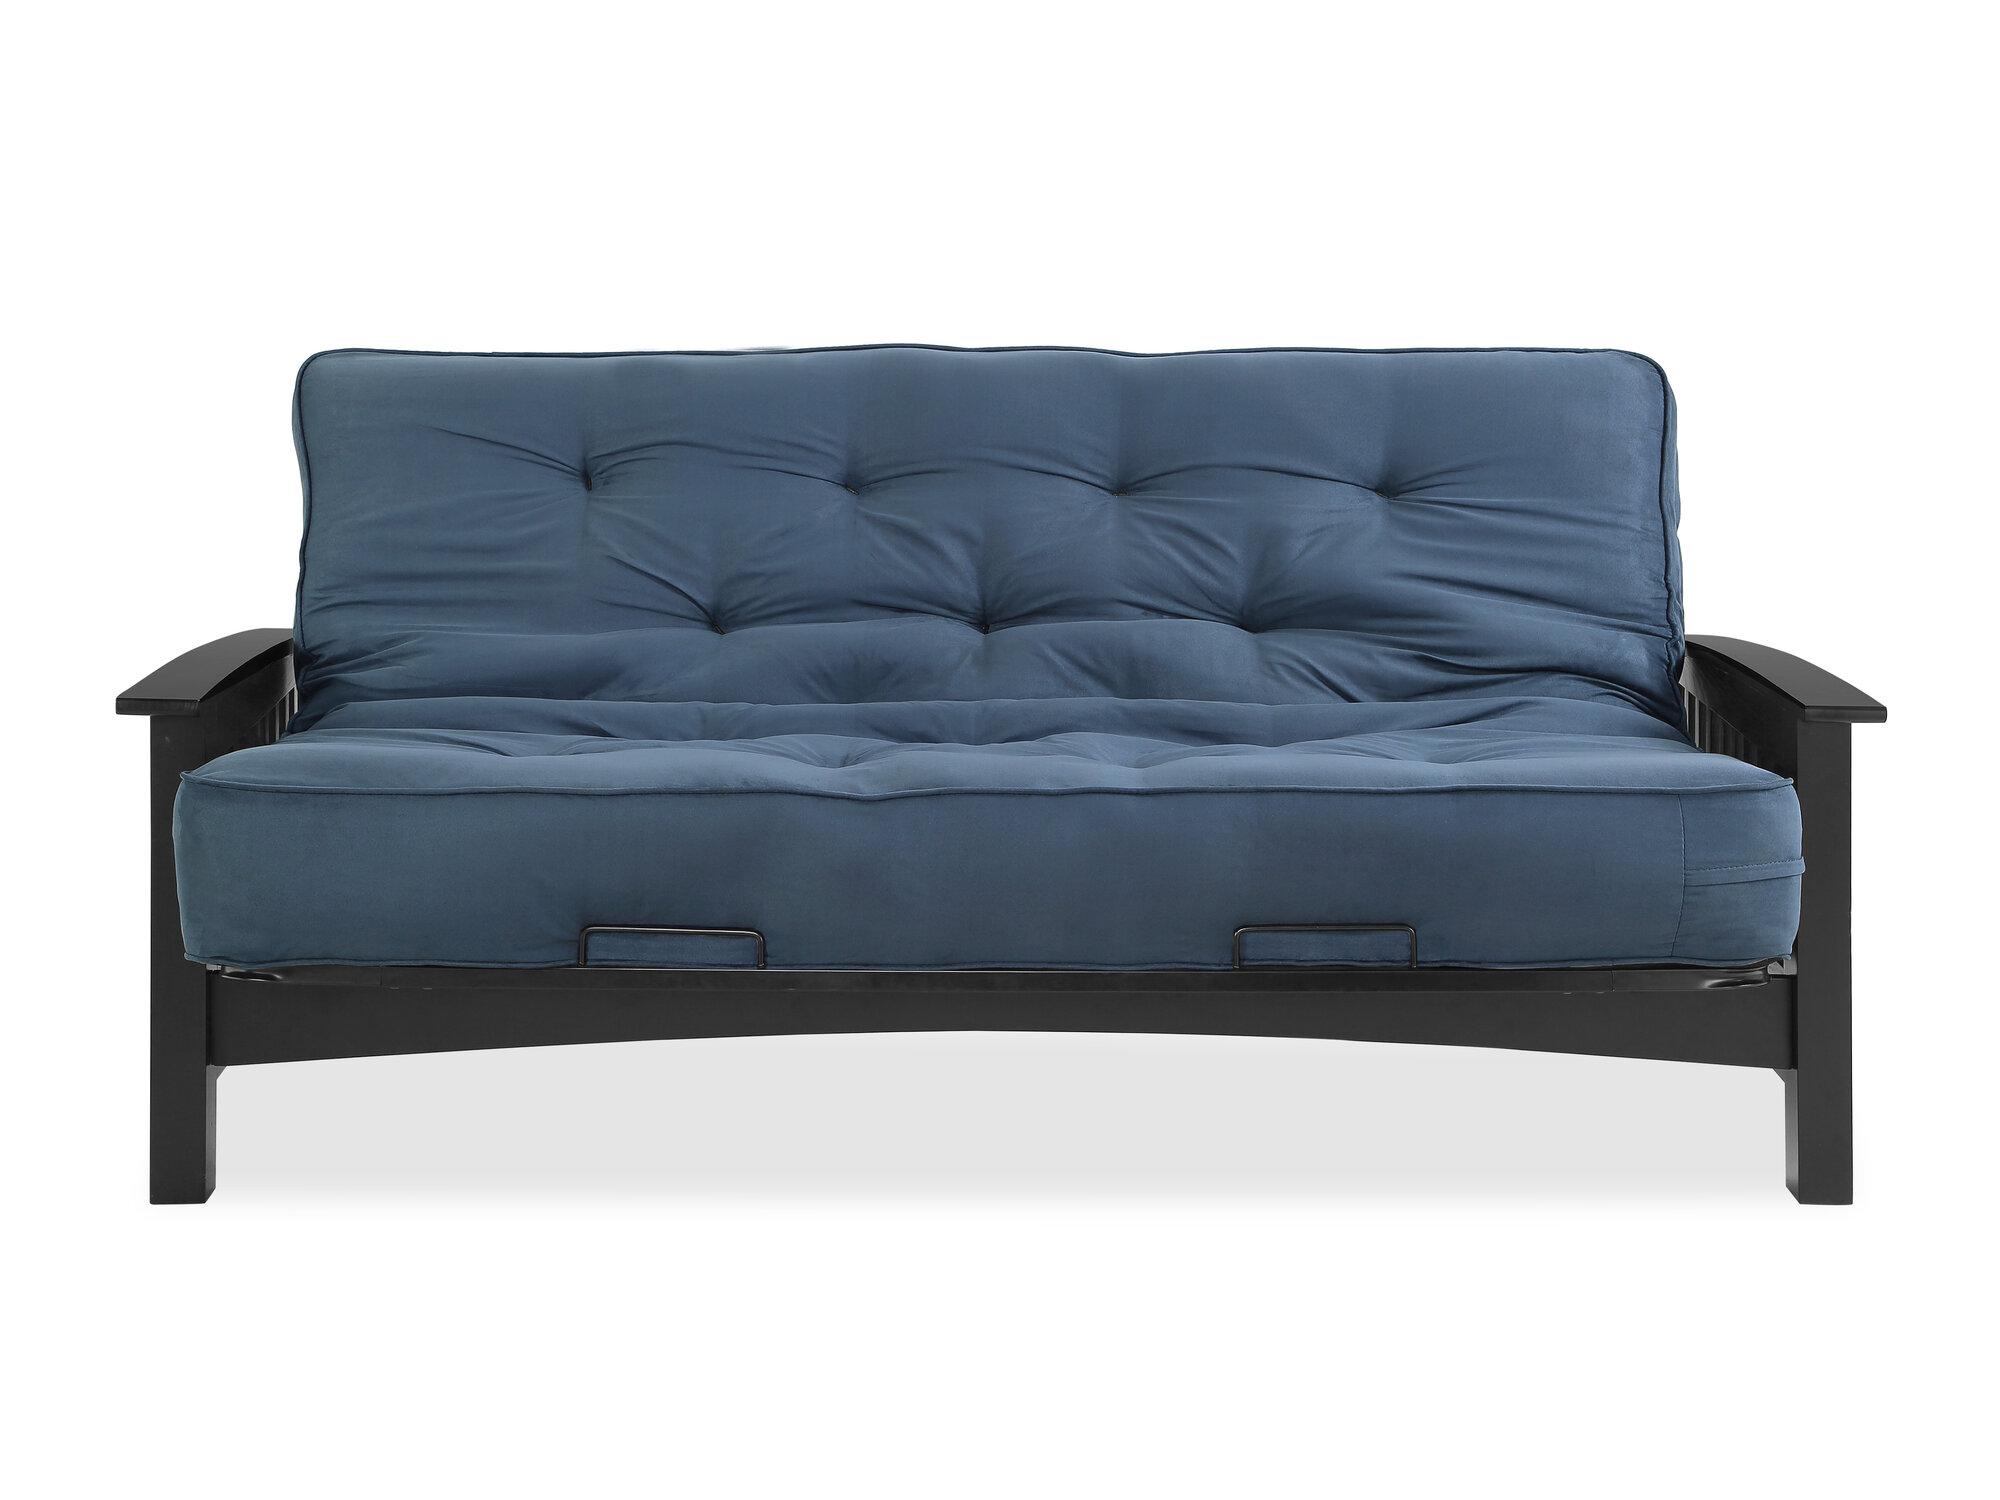 simmons futons denver futon and mattress futons in denver   furniture shop  rh   ekonomikmobilyacarsisi